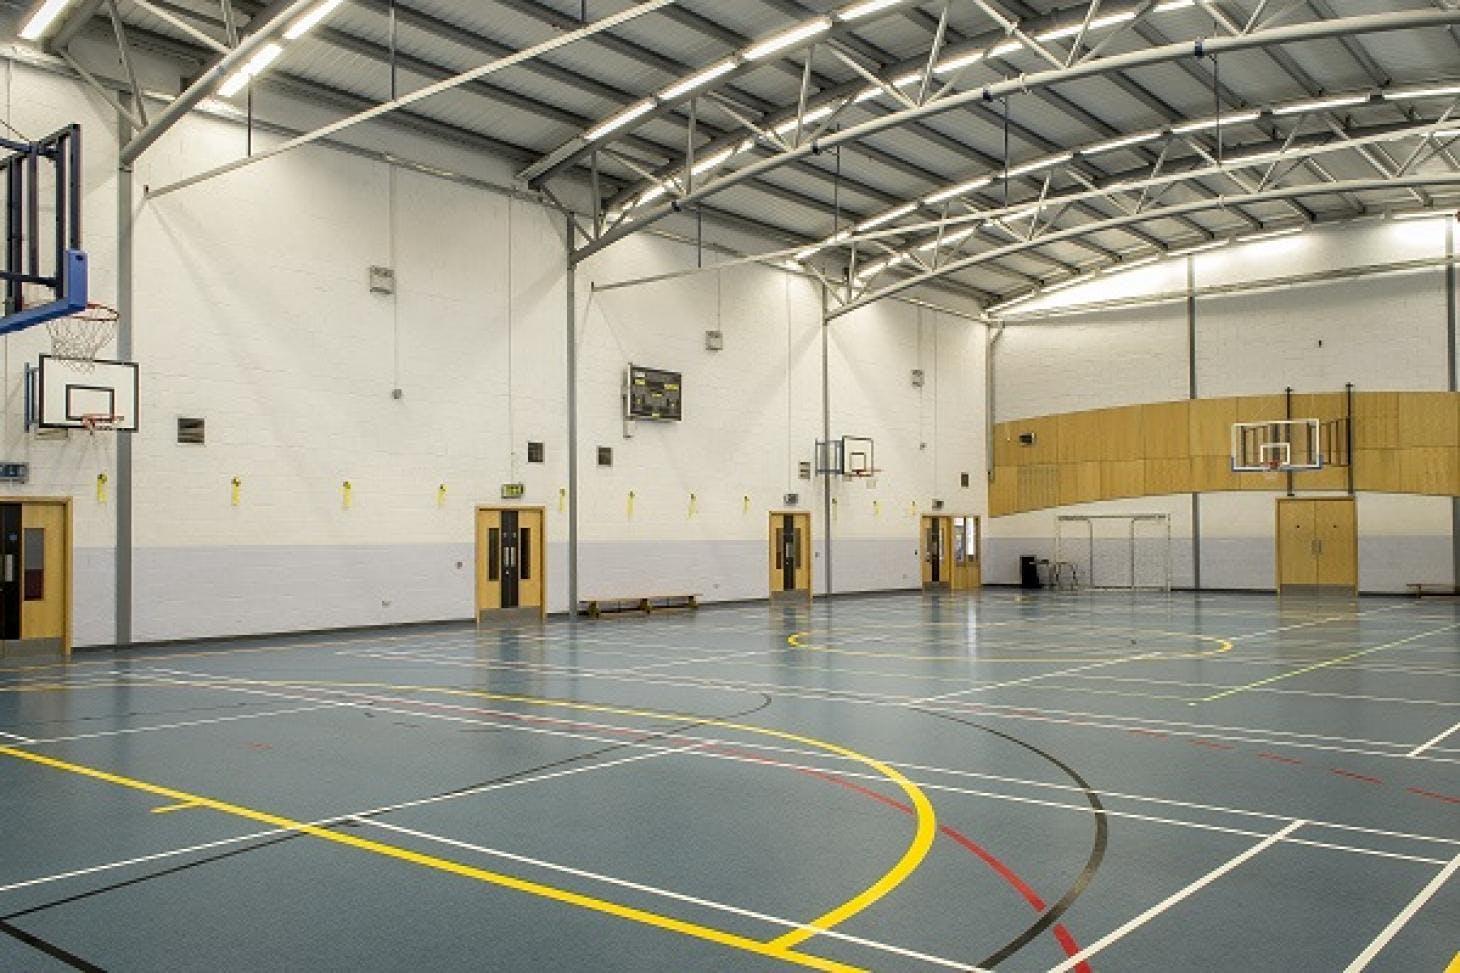 Corduff Sports Centre Indoor basketball court